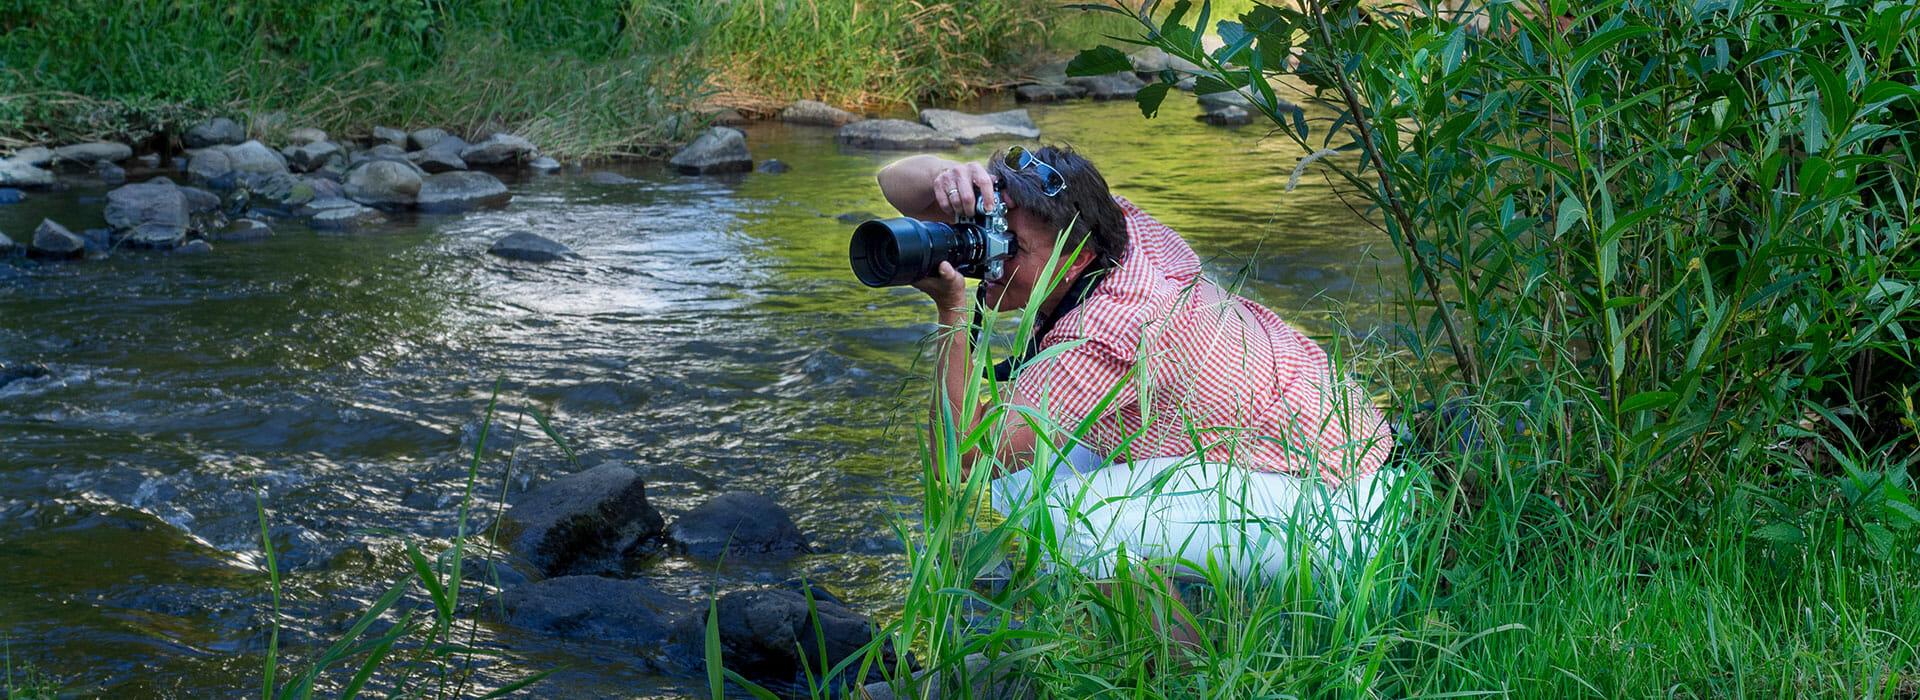 Fotografie Fotoshooting an der Krems